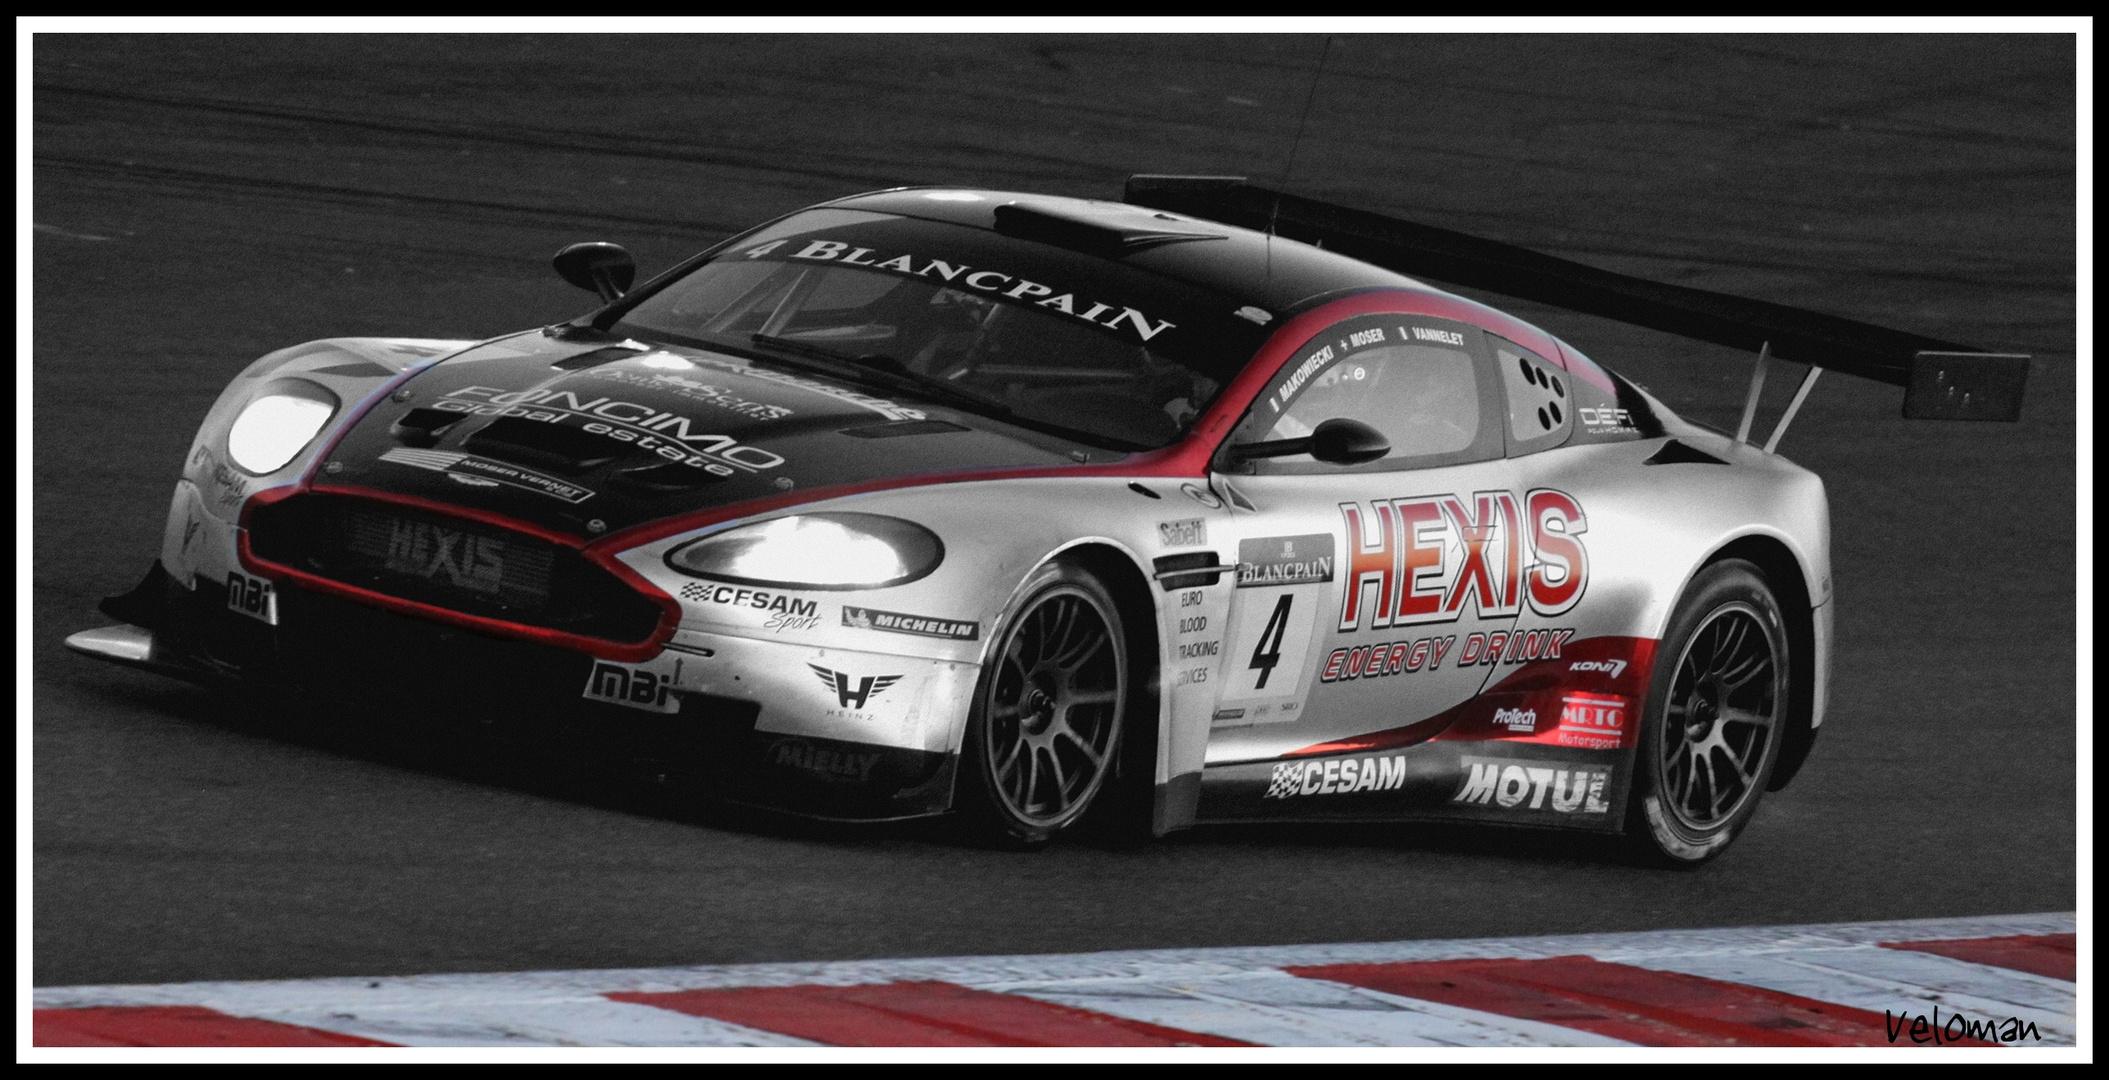 Aston Martin du team hexis